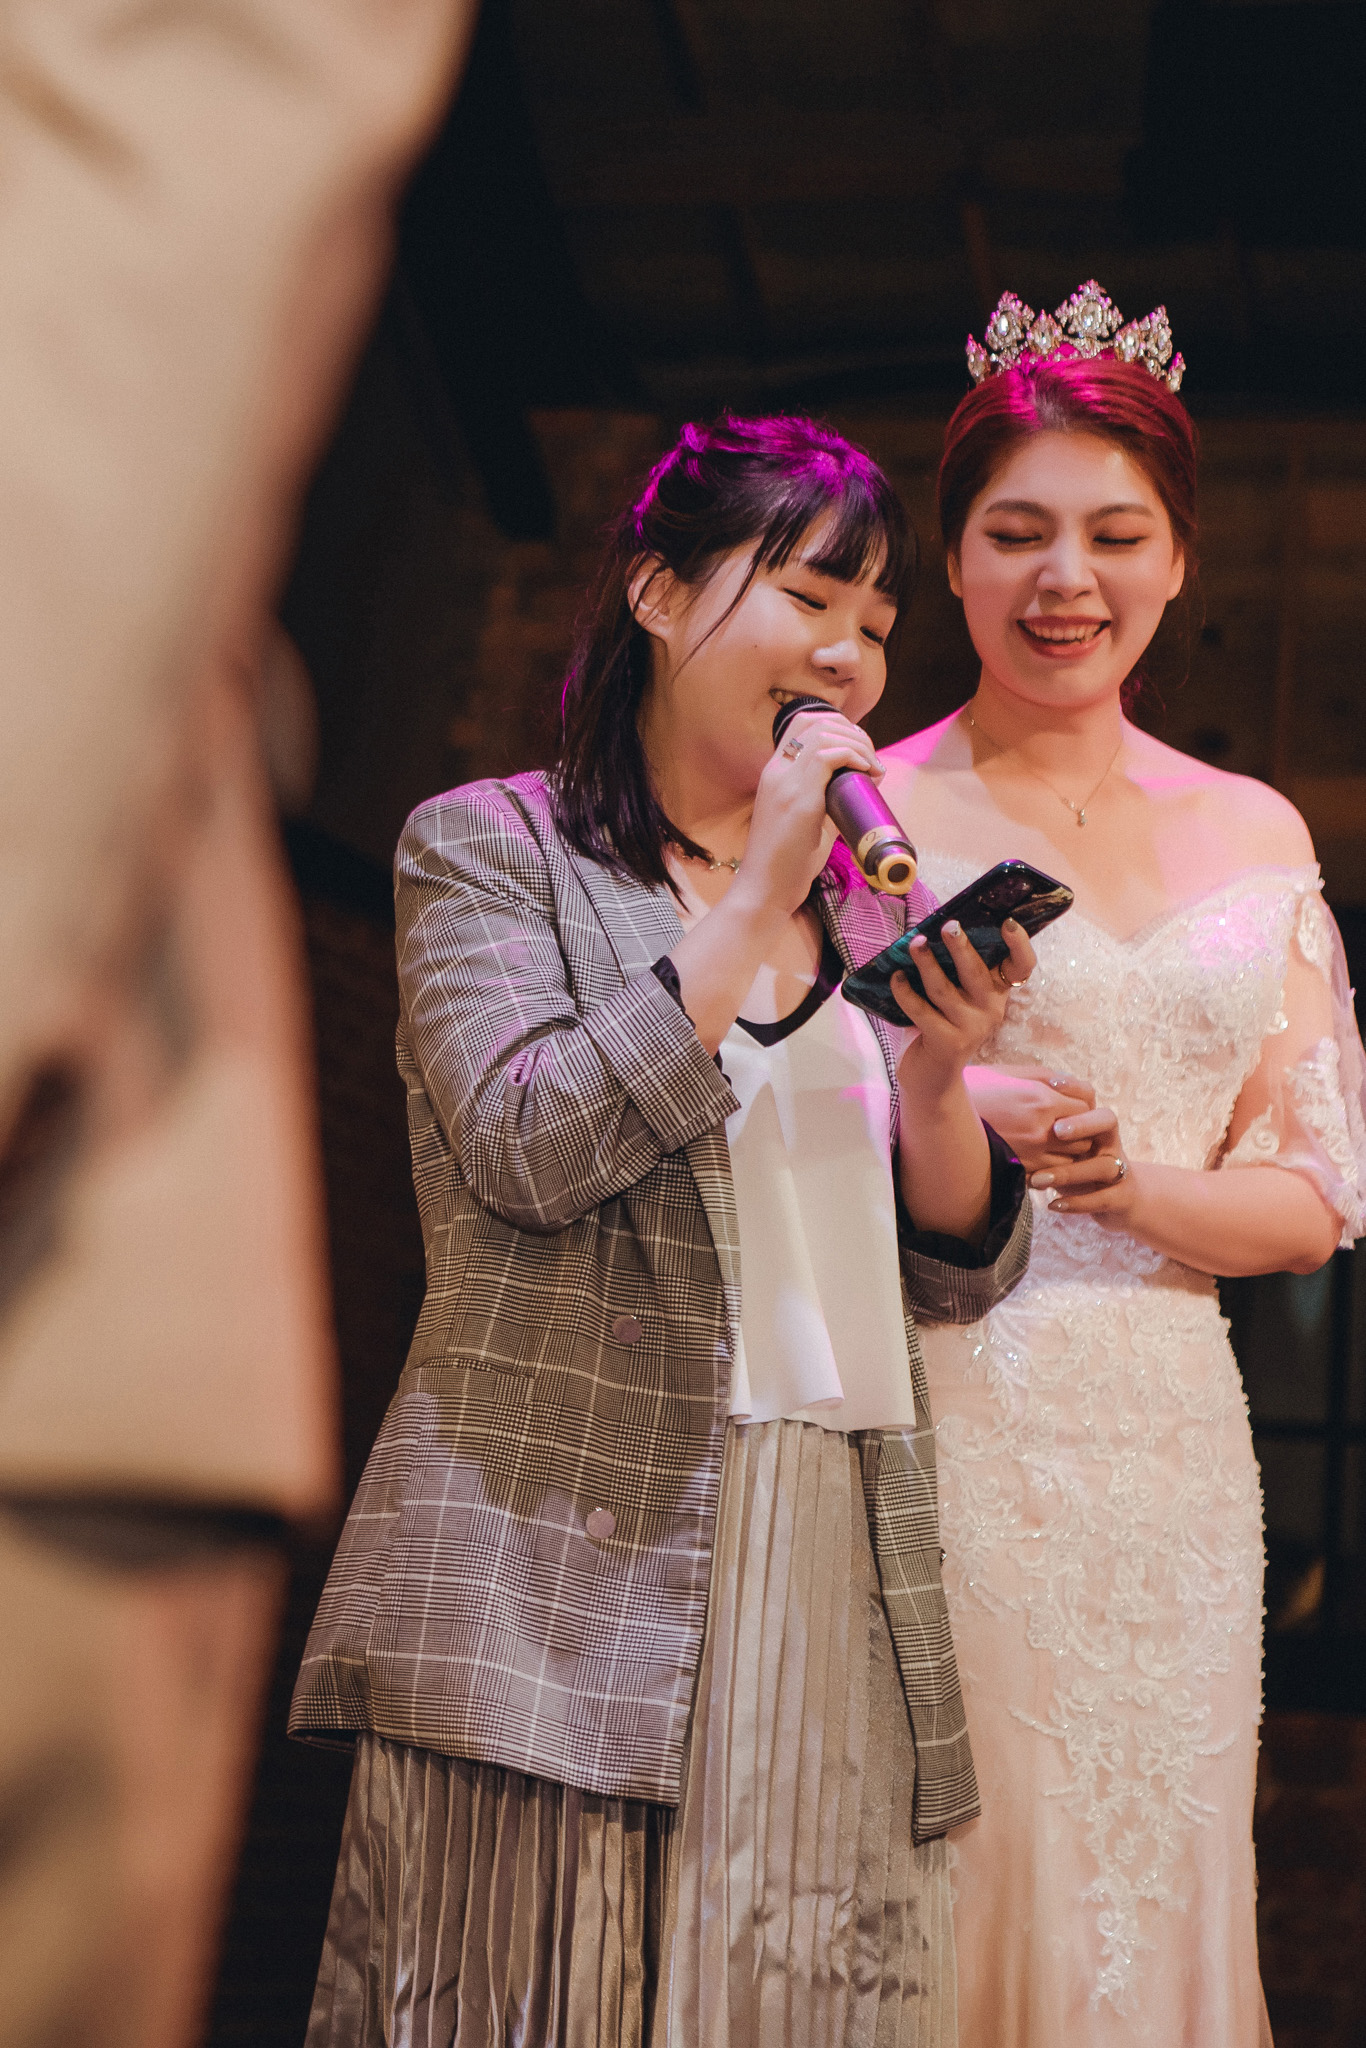 EW 台北婚攝 居米 濟南教會 Brick Yard 33 美軍俱樂部 婚禮 婚宴-105